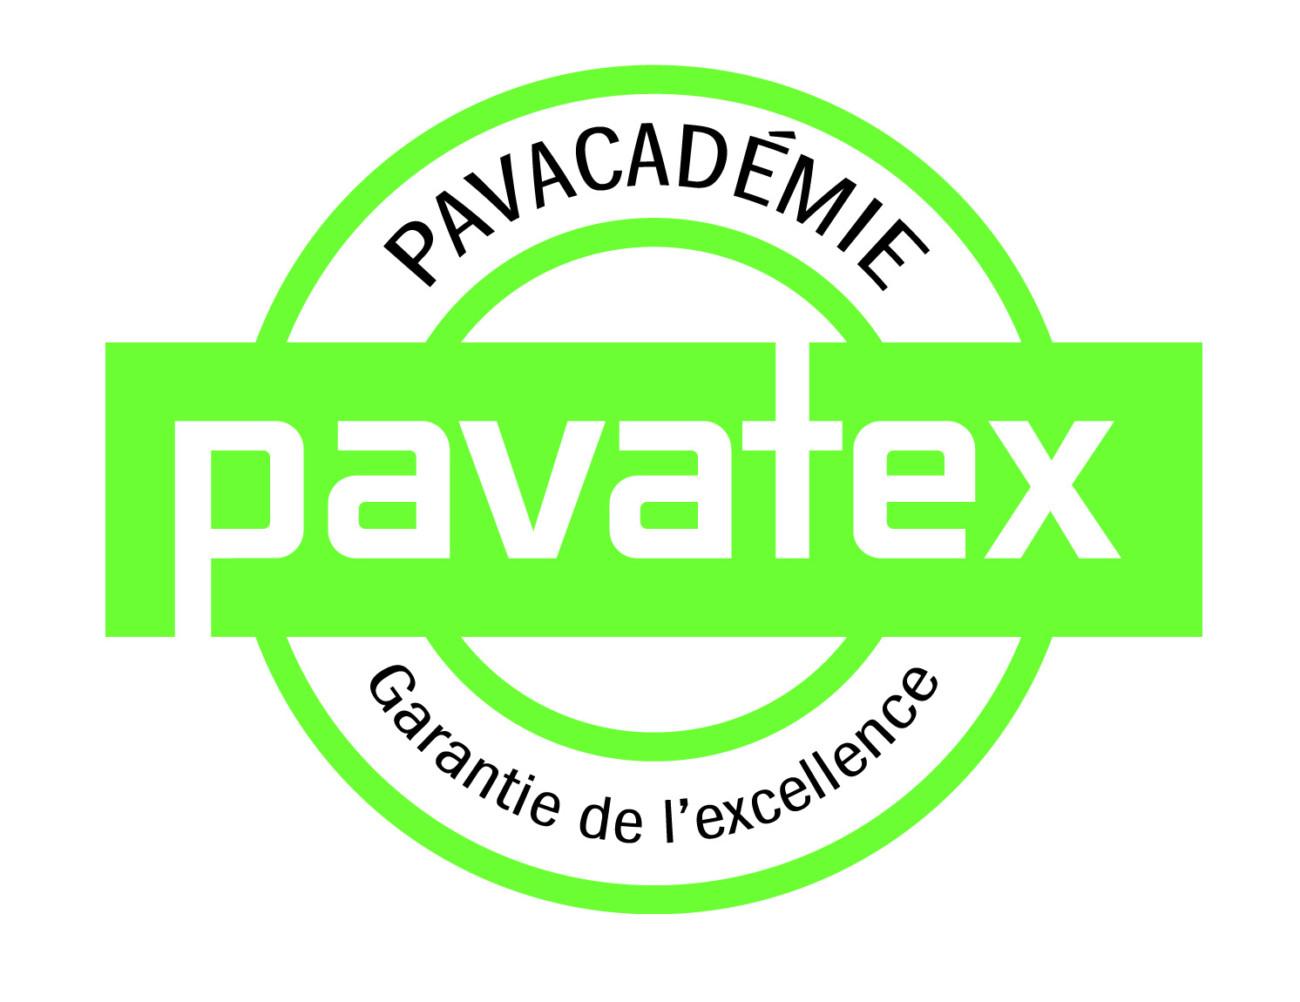 logo pavacadmie 2015